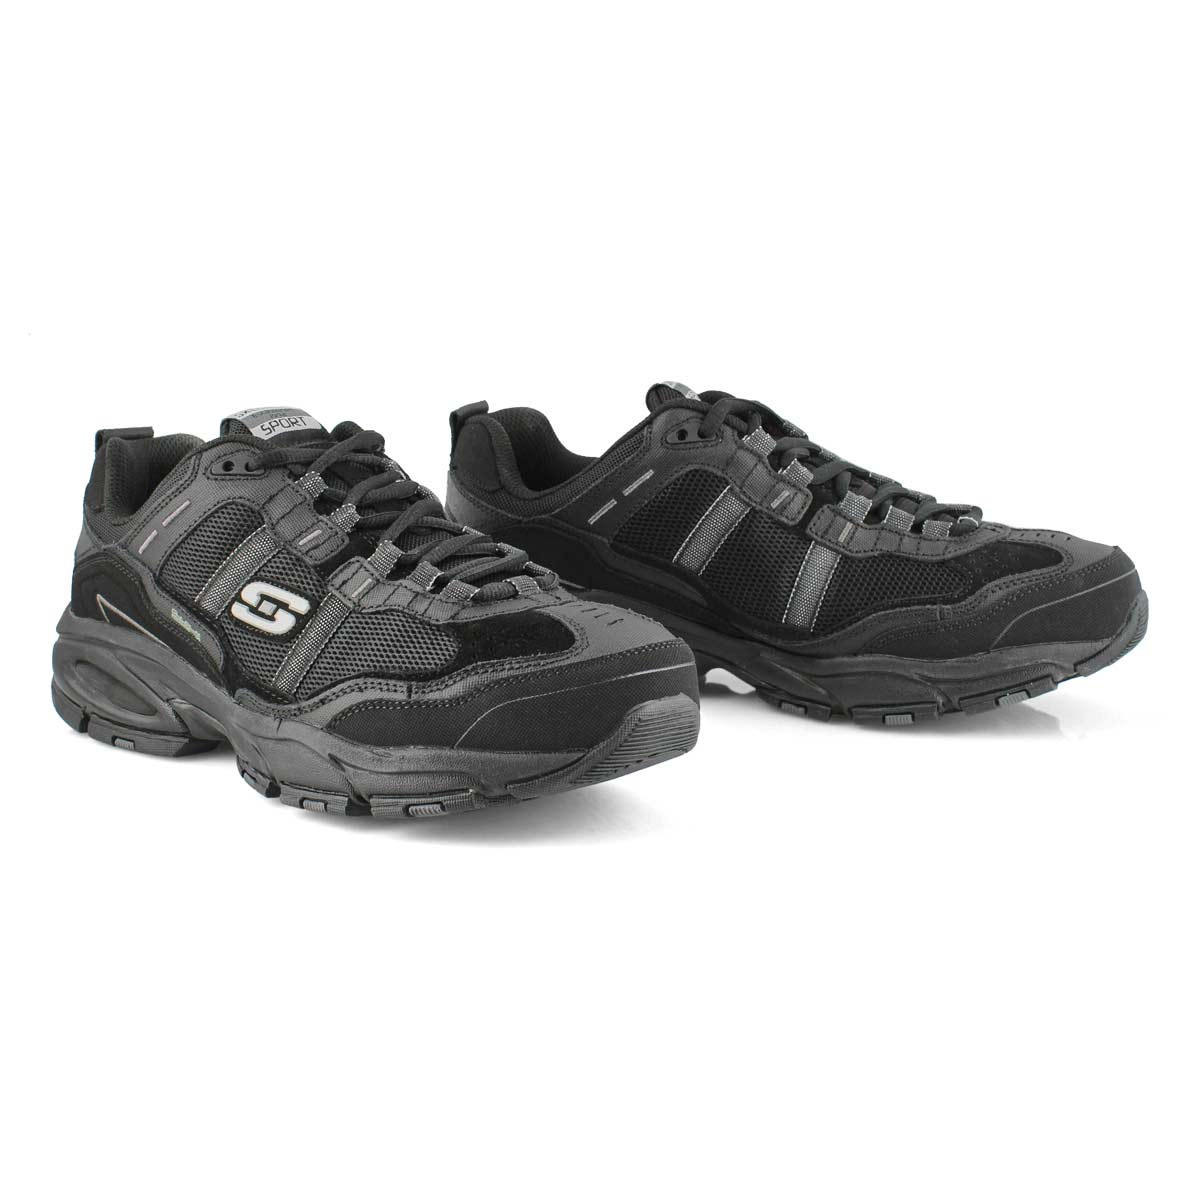 Men's Vigor 2.0 Trait Running Shoe Wide - Black